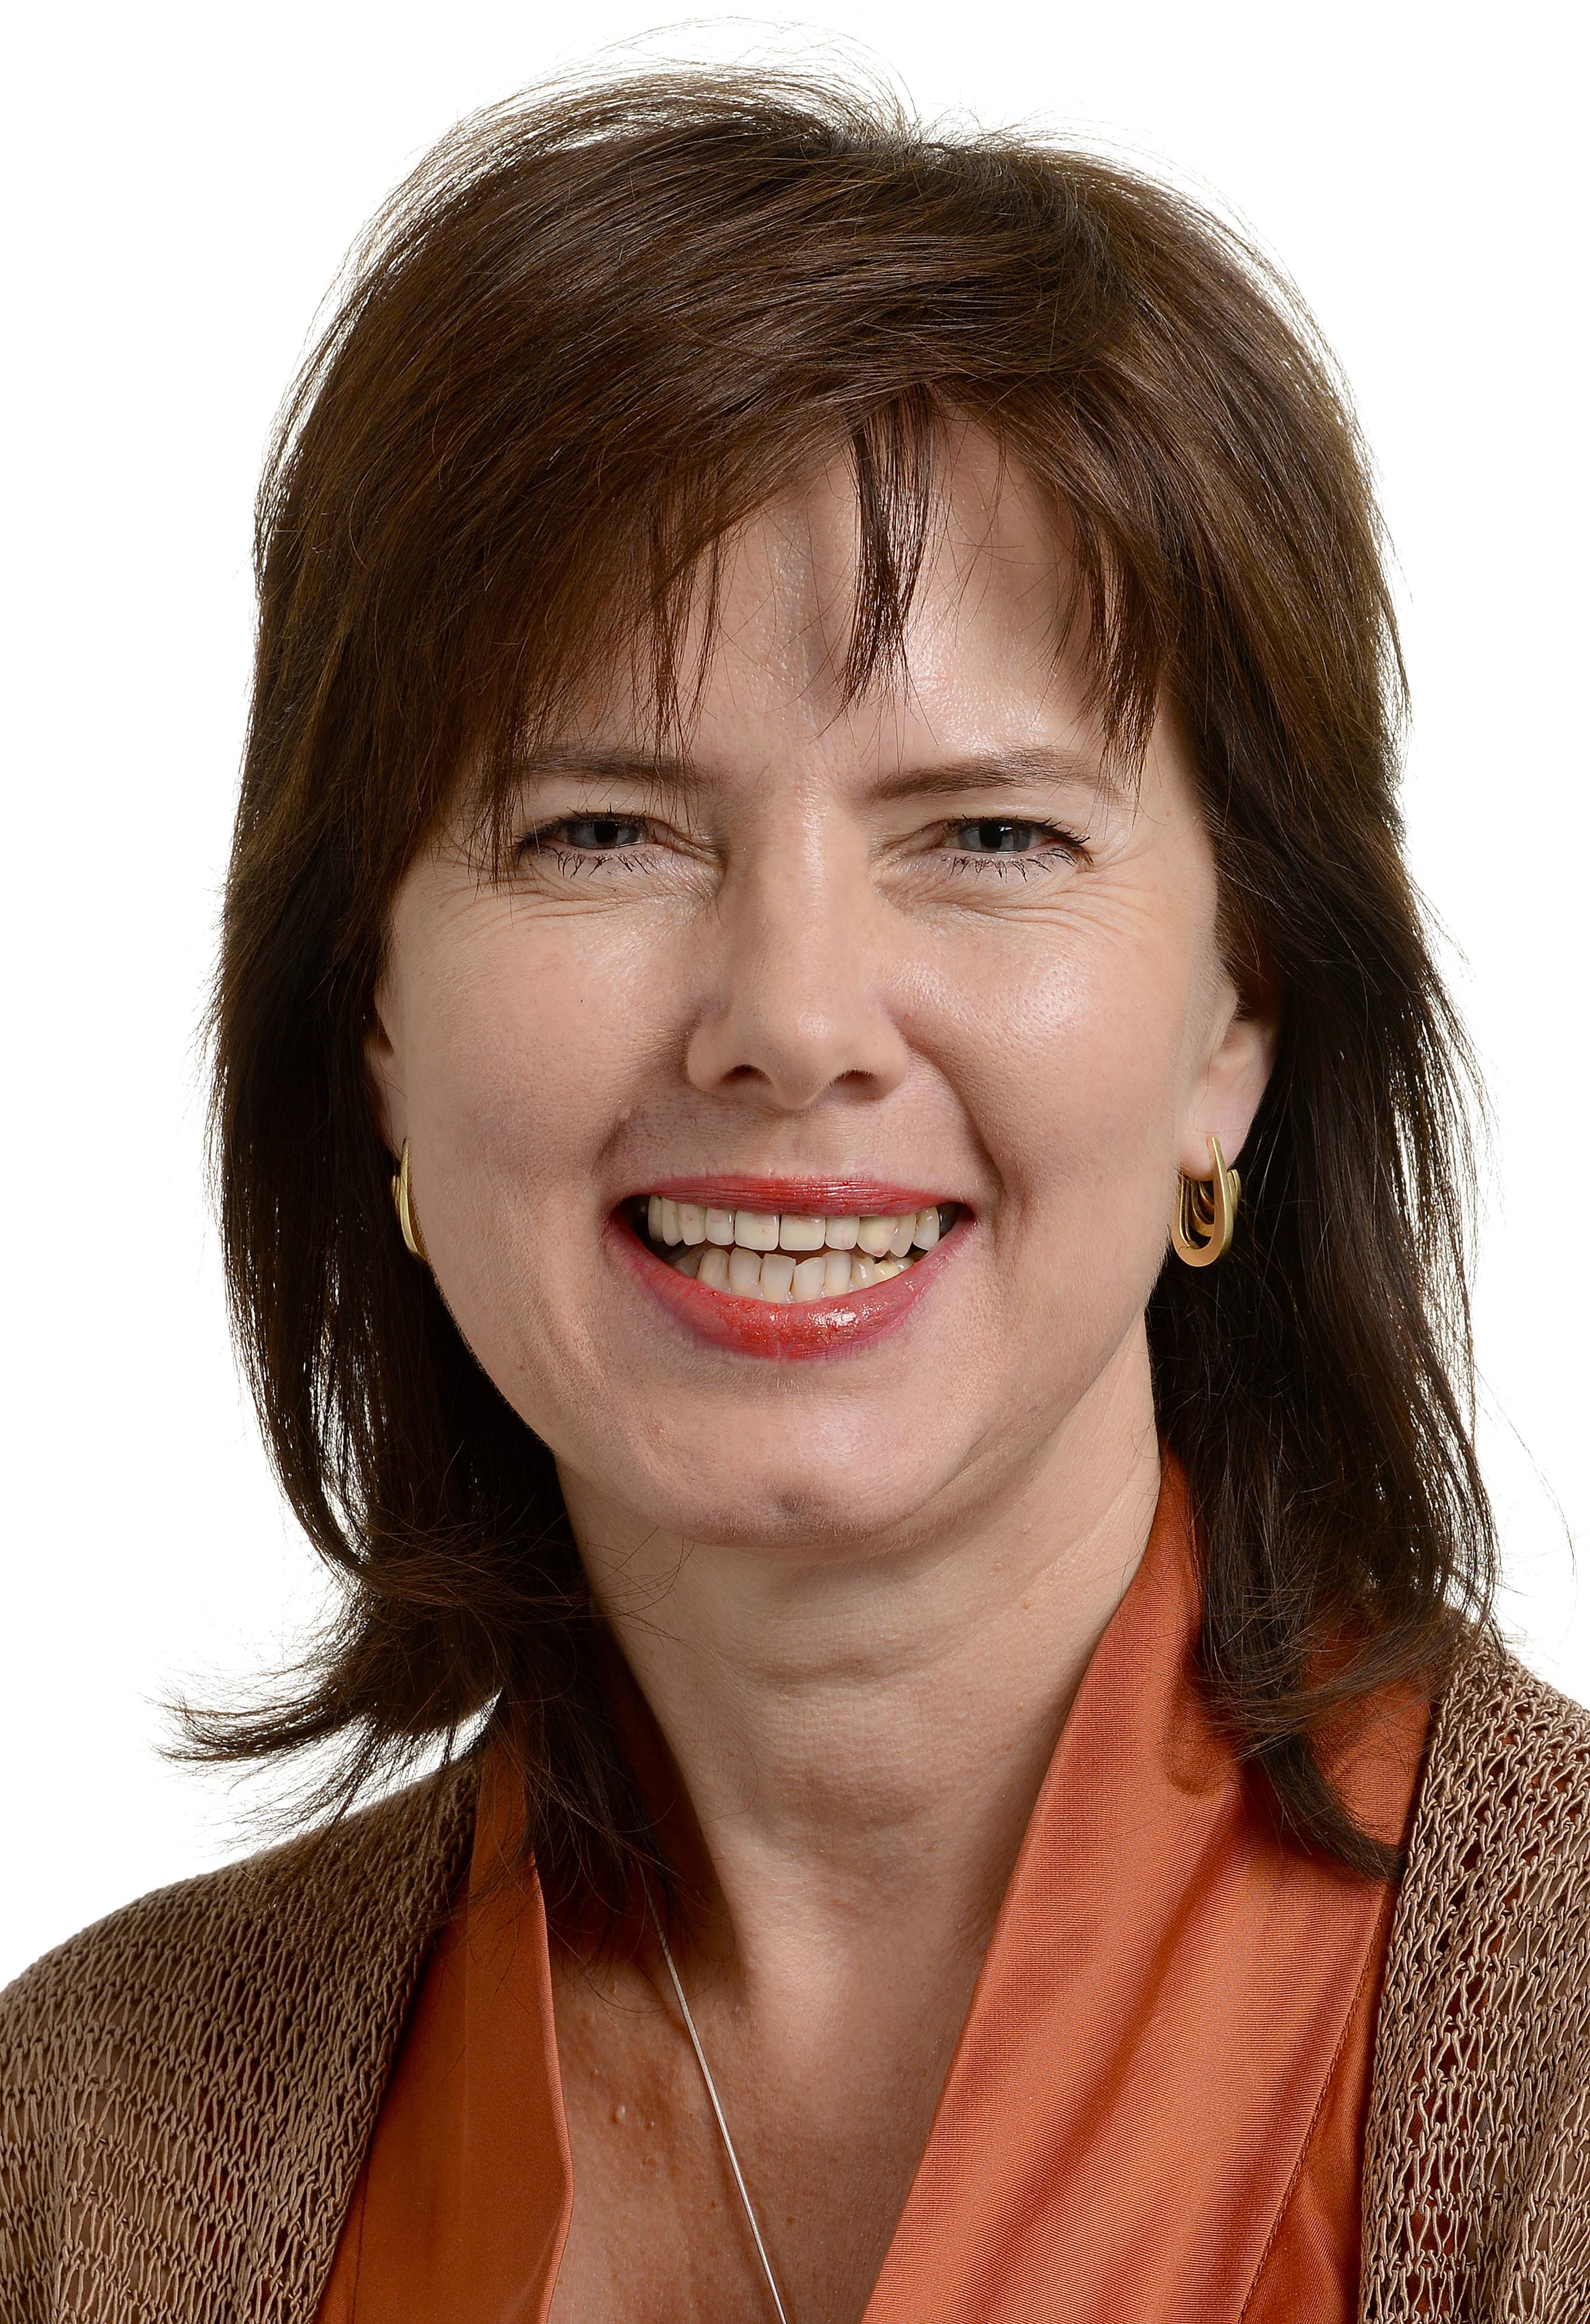 Cora van NIEUWENHUIZEN - 8th Parliamentary term